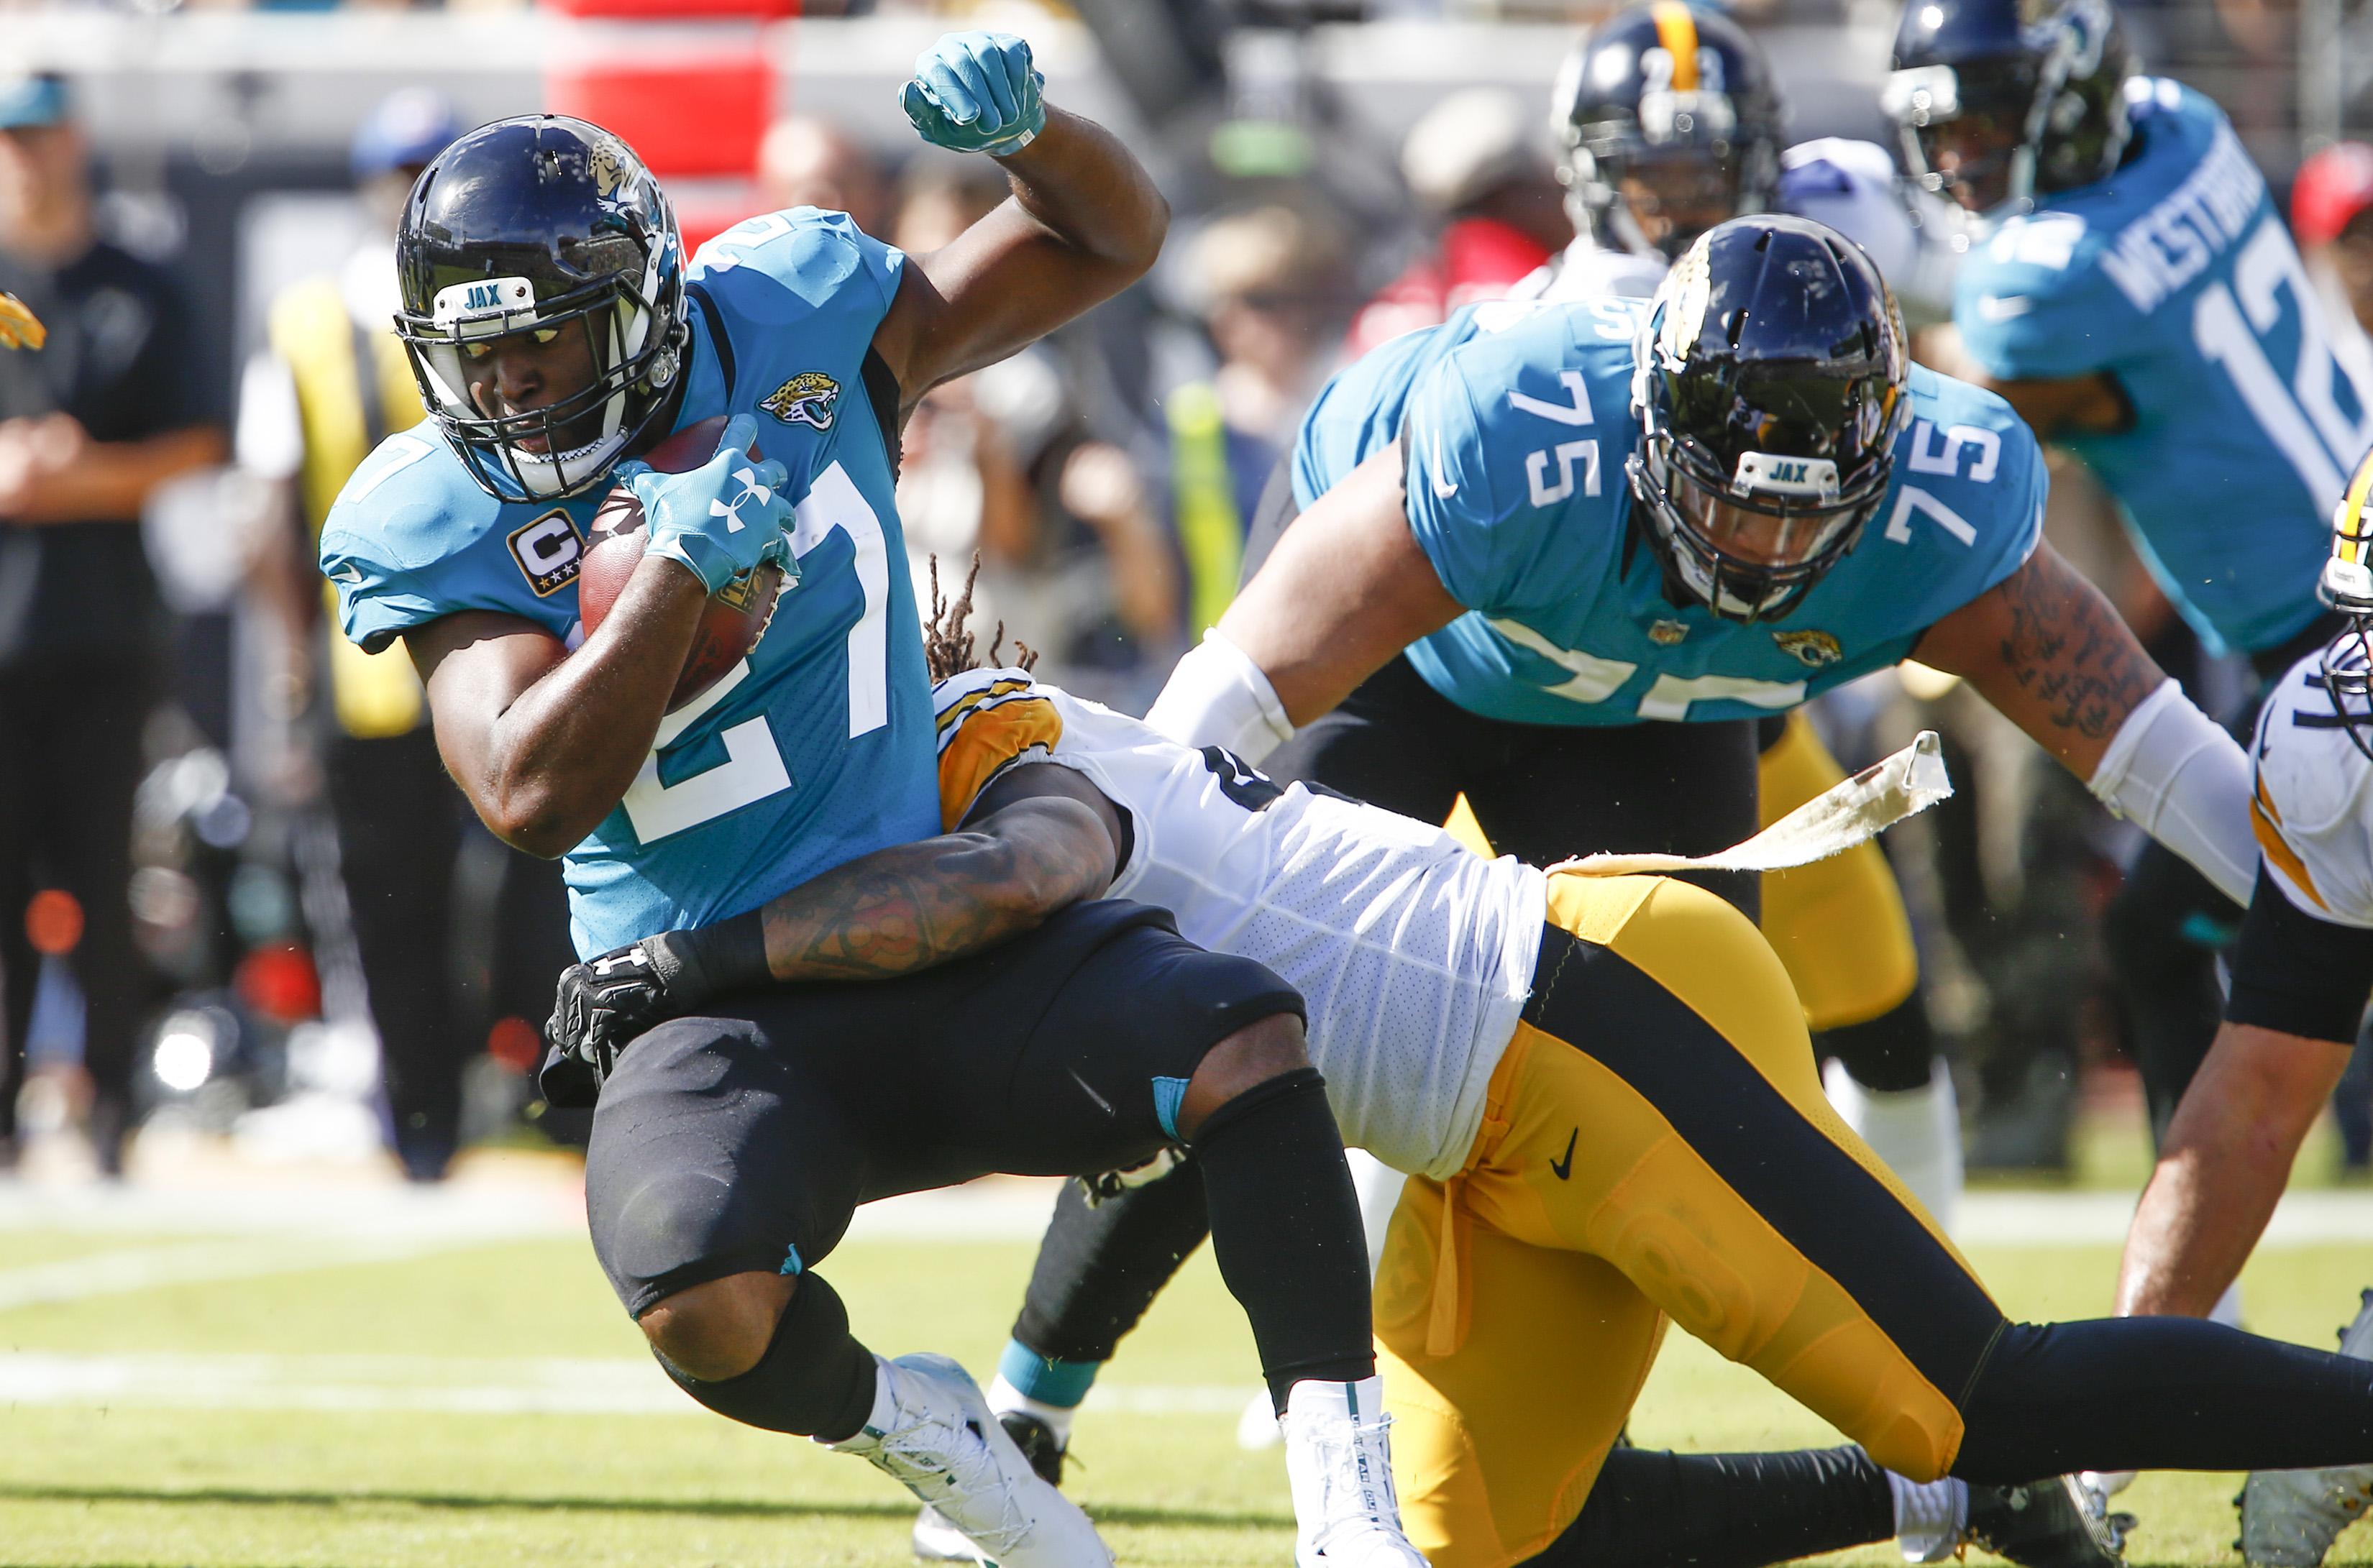 NFL: Pittsburgh Steelers at Jacksonville Jaguars